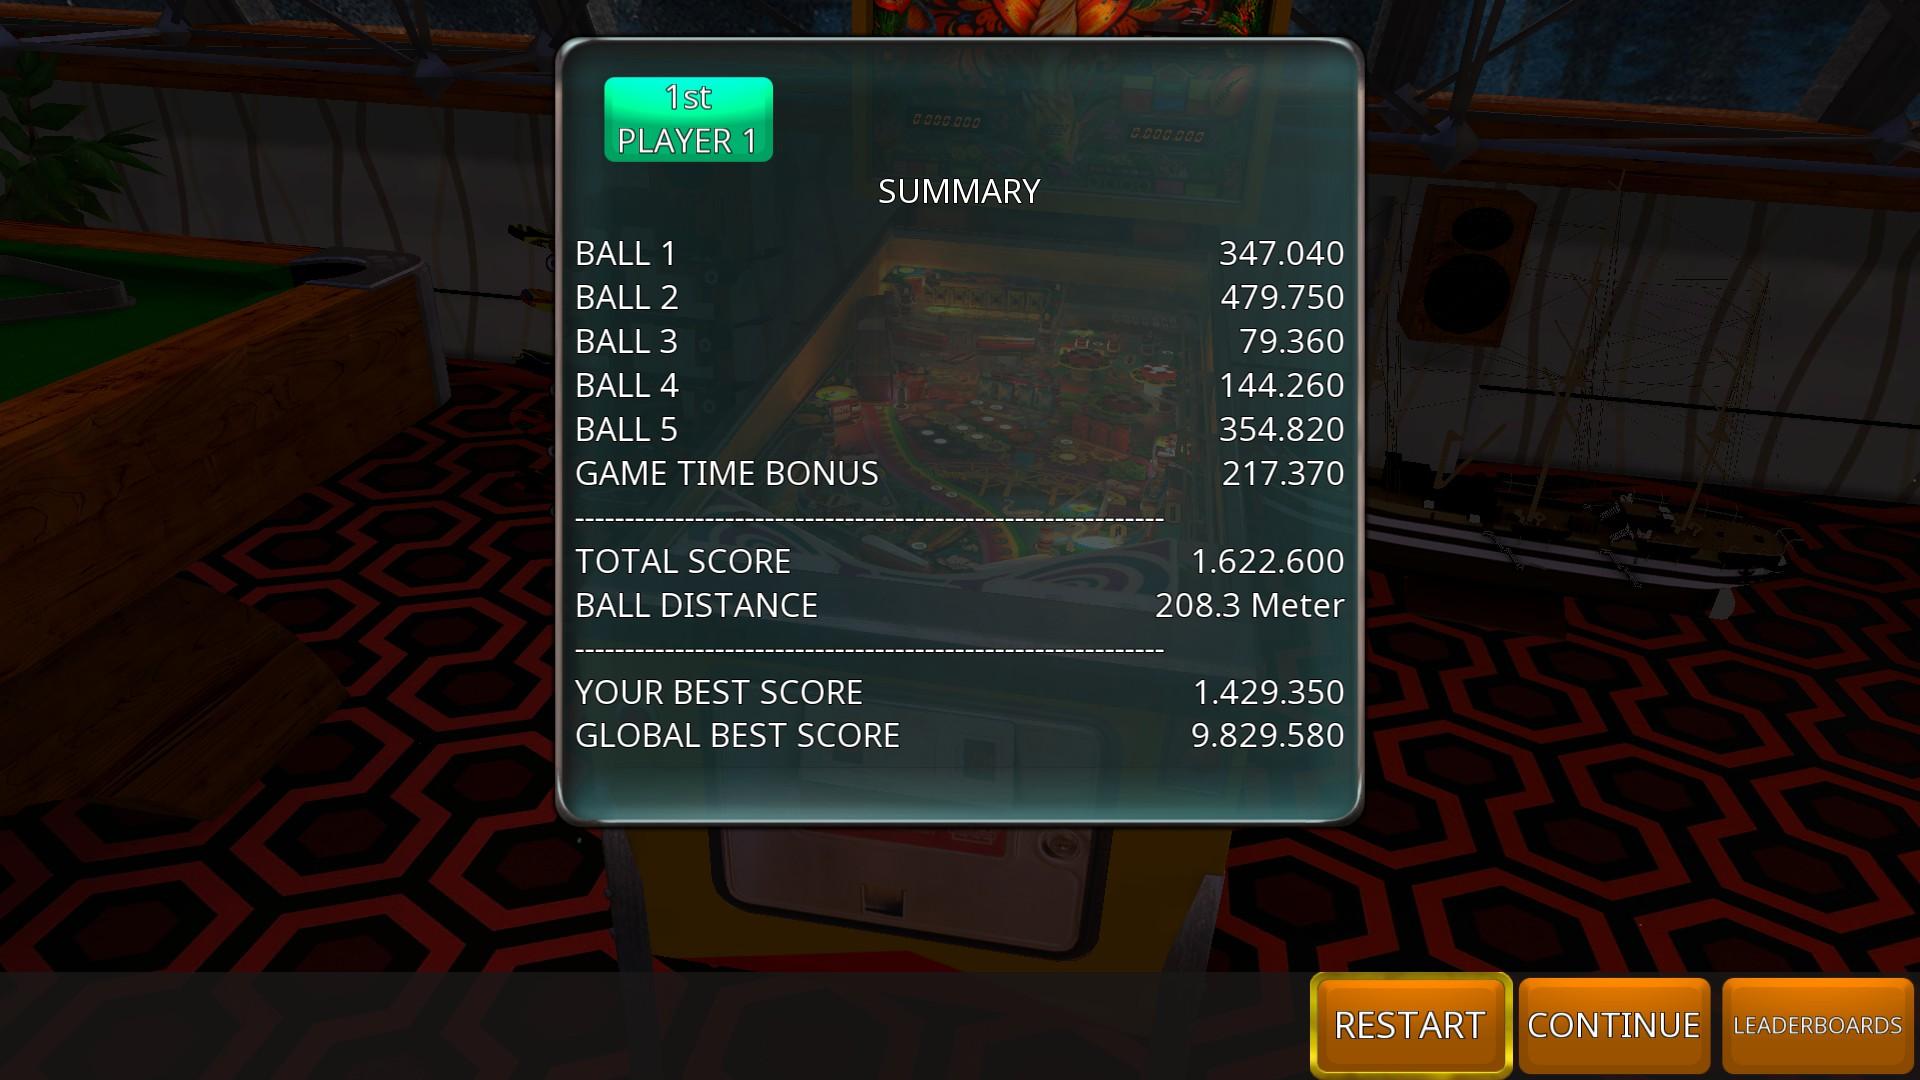 Zaccaria Pinball: Farfalla [5 balls] 1,622,600 points